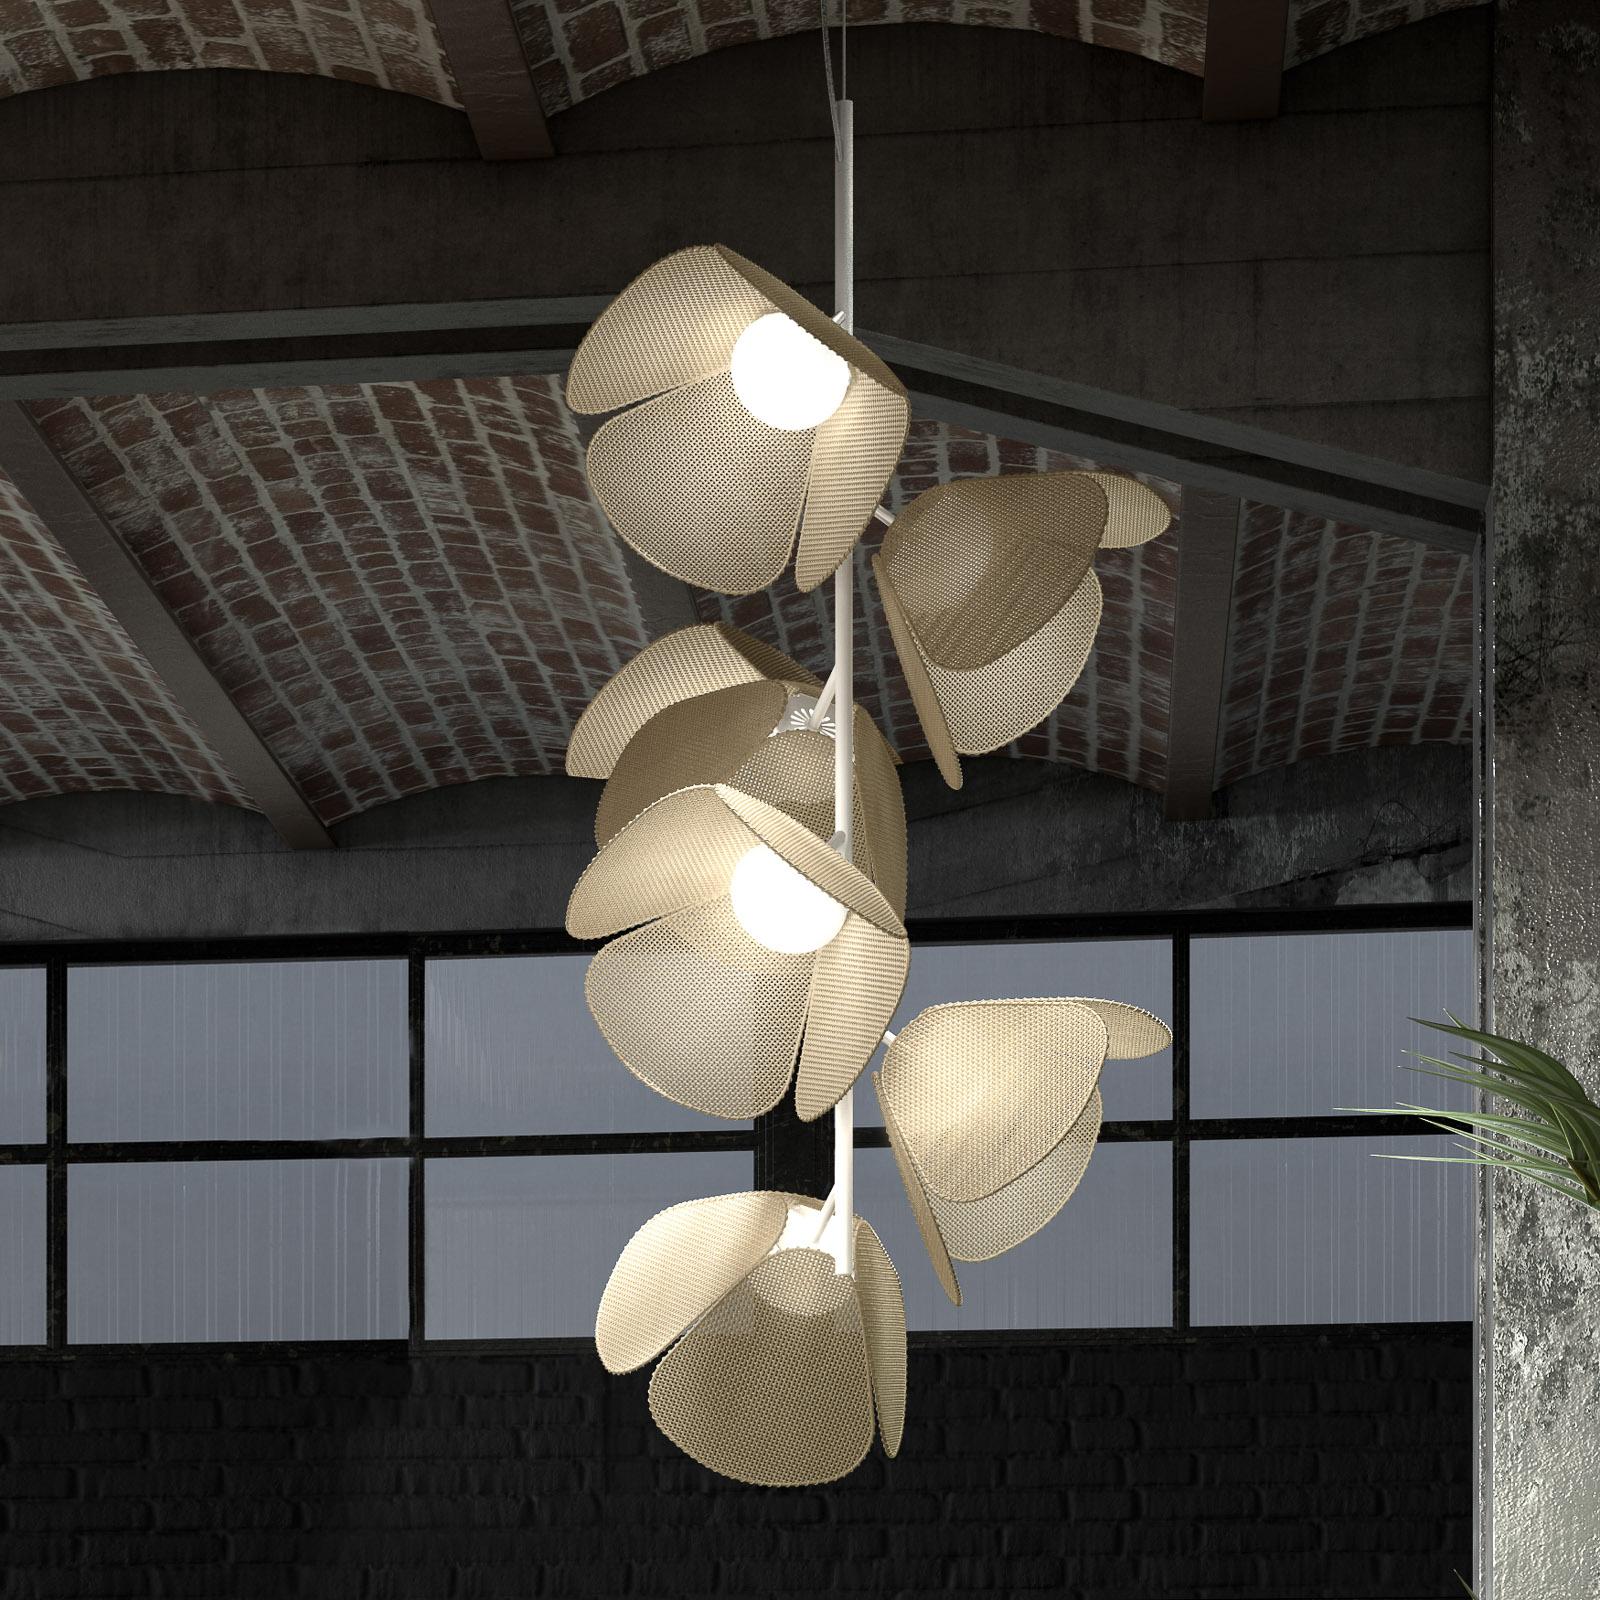 Bover Mod PF/73/6L LED plafondlamp, natuurvezel